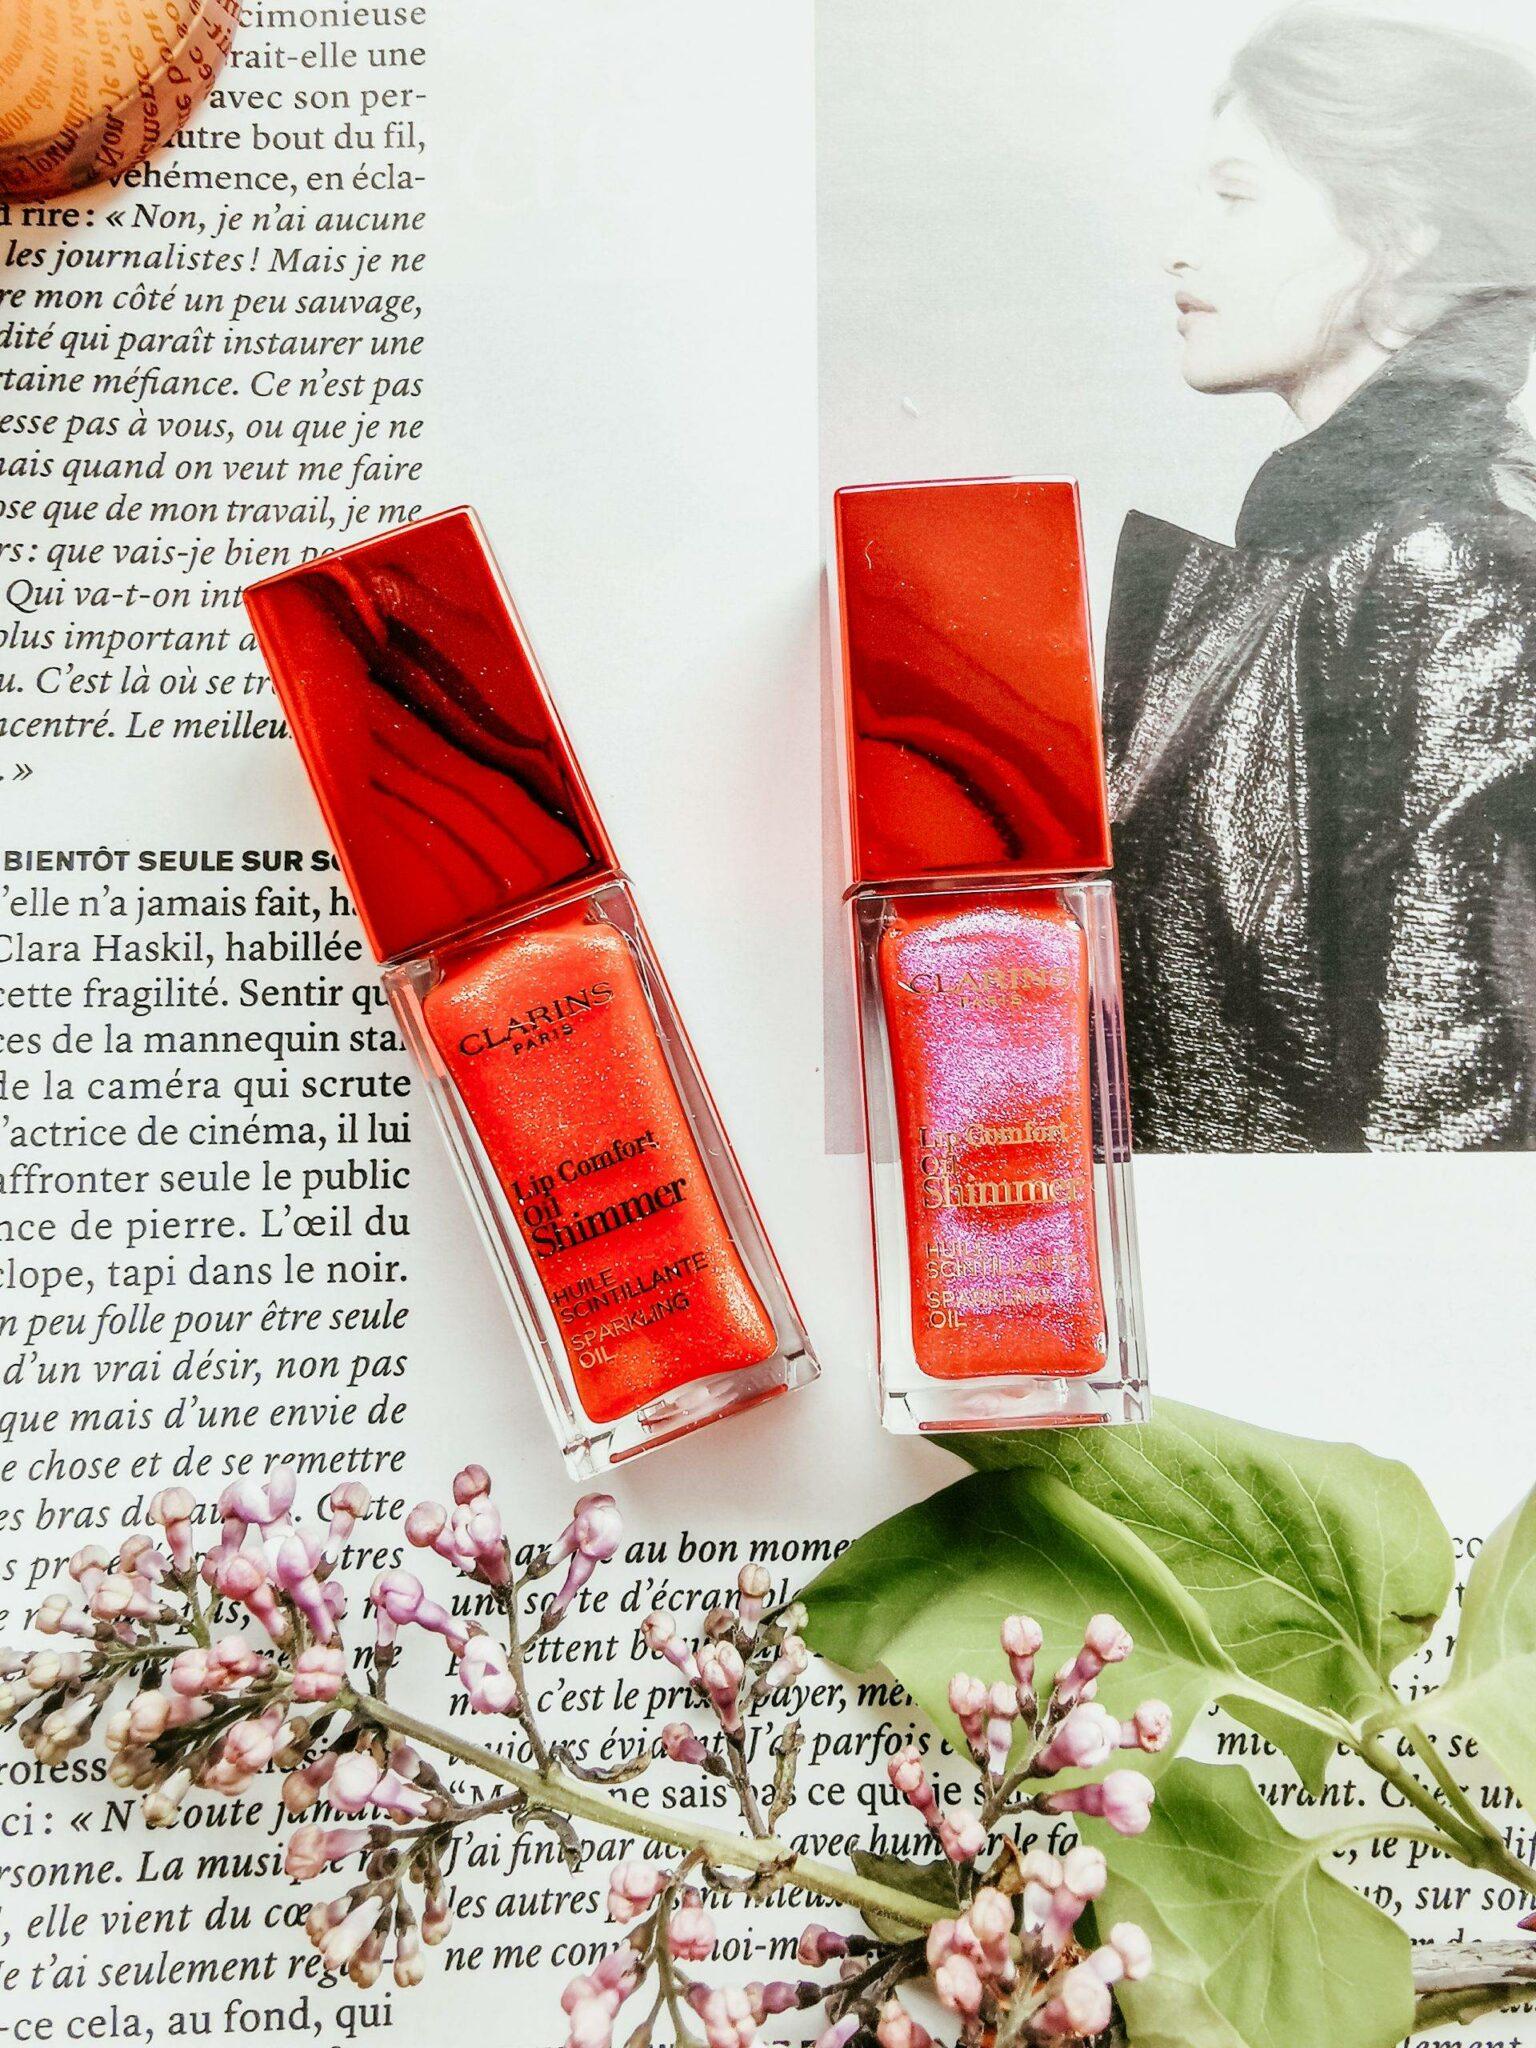 New Lip Comfort Oil Shimmer by Clarins review  by Izabela Switon-Kulinska Bella_zofia Swiss Blogger, Swiss Influencer